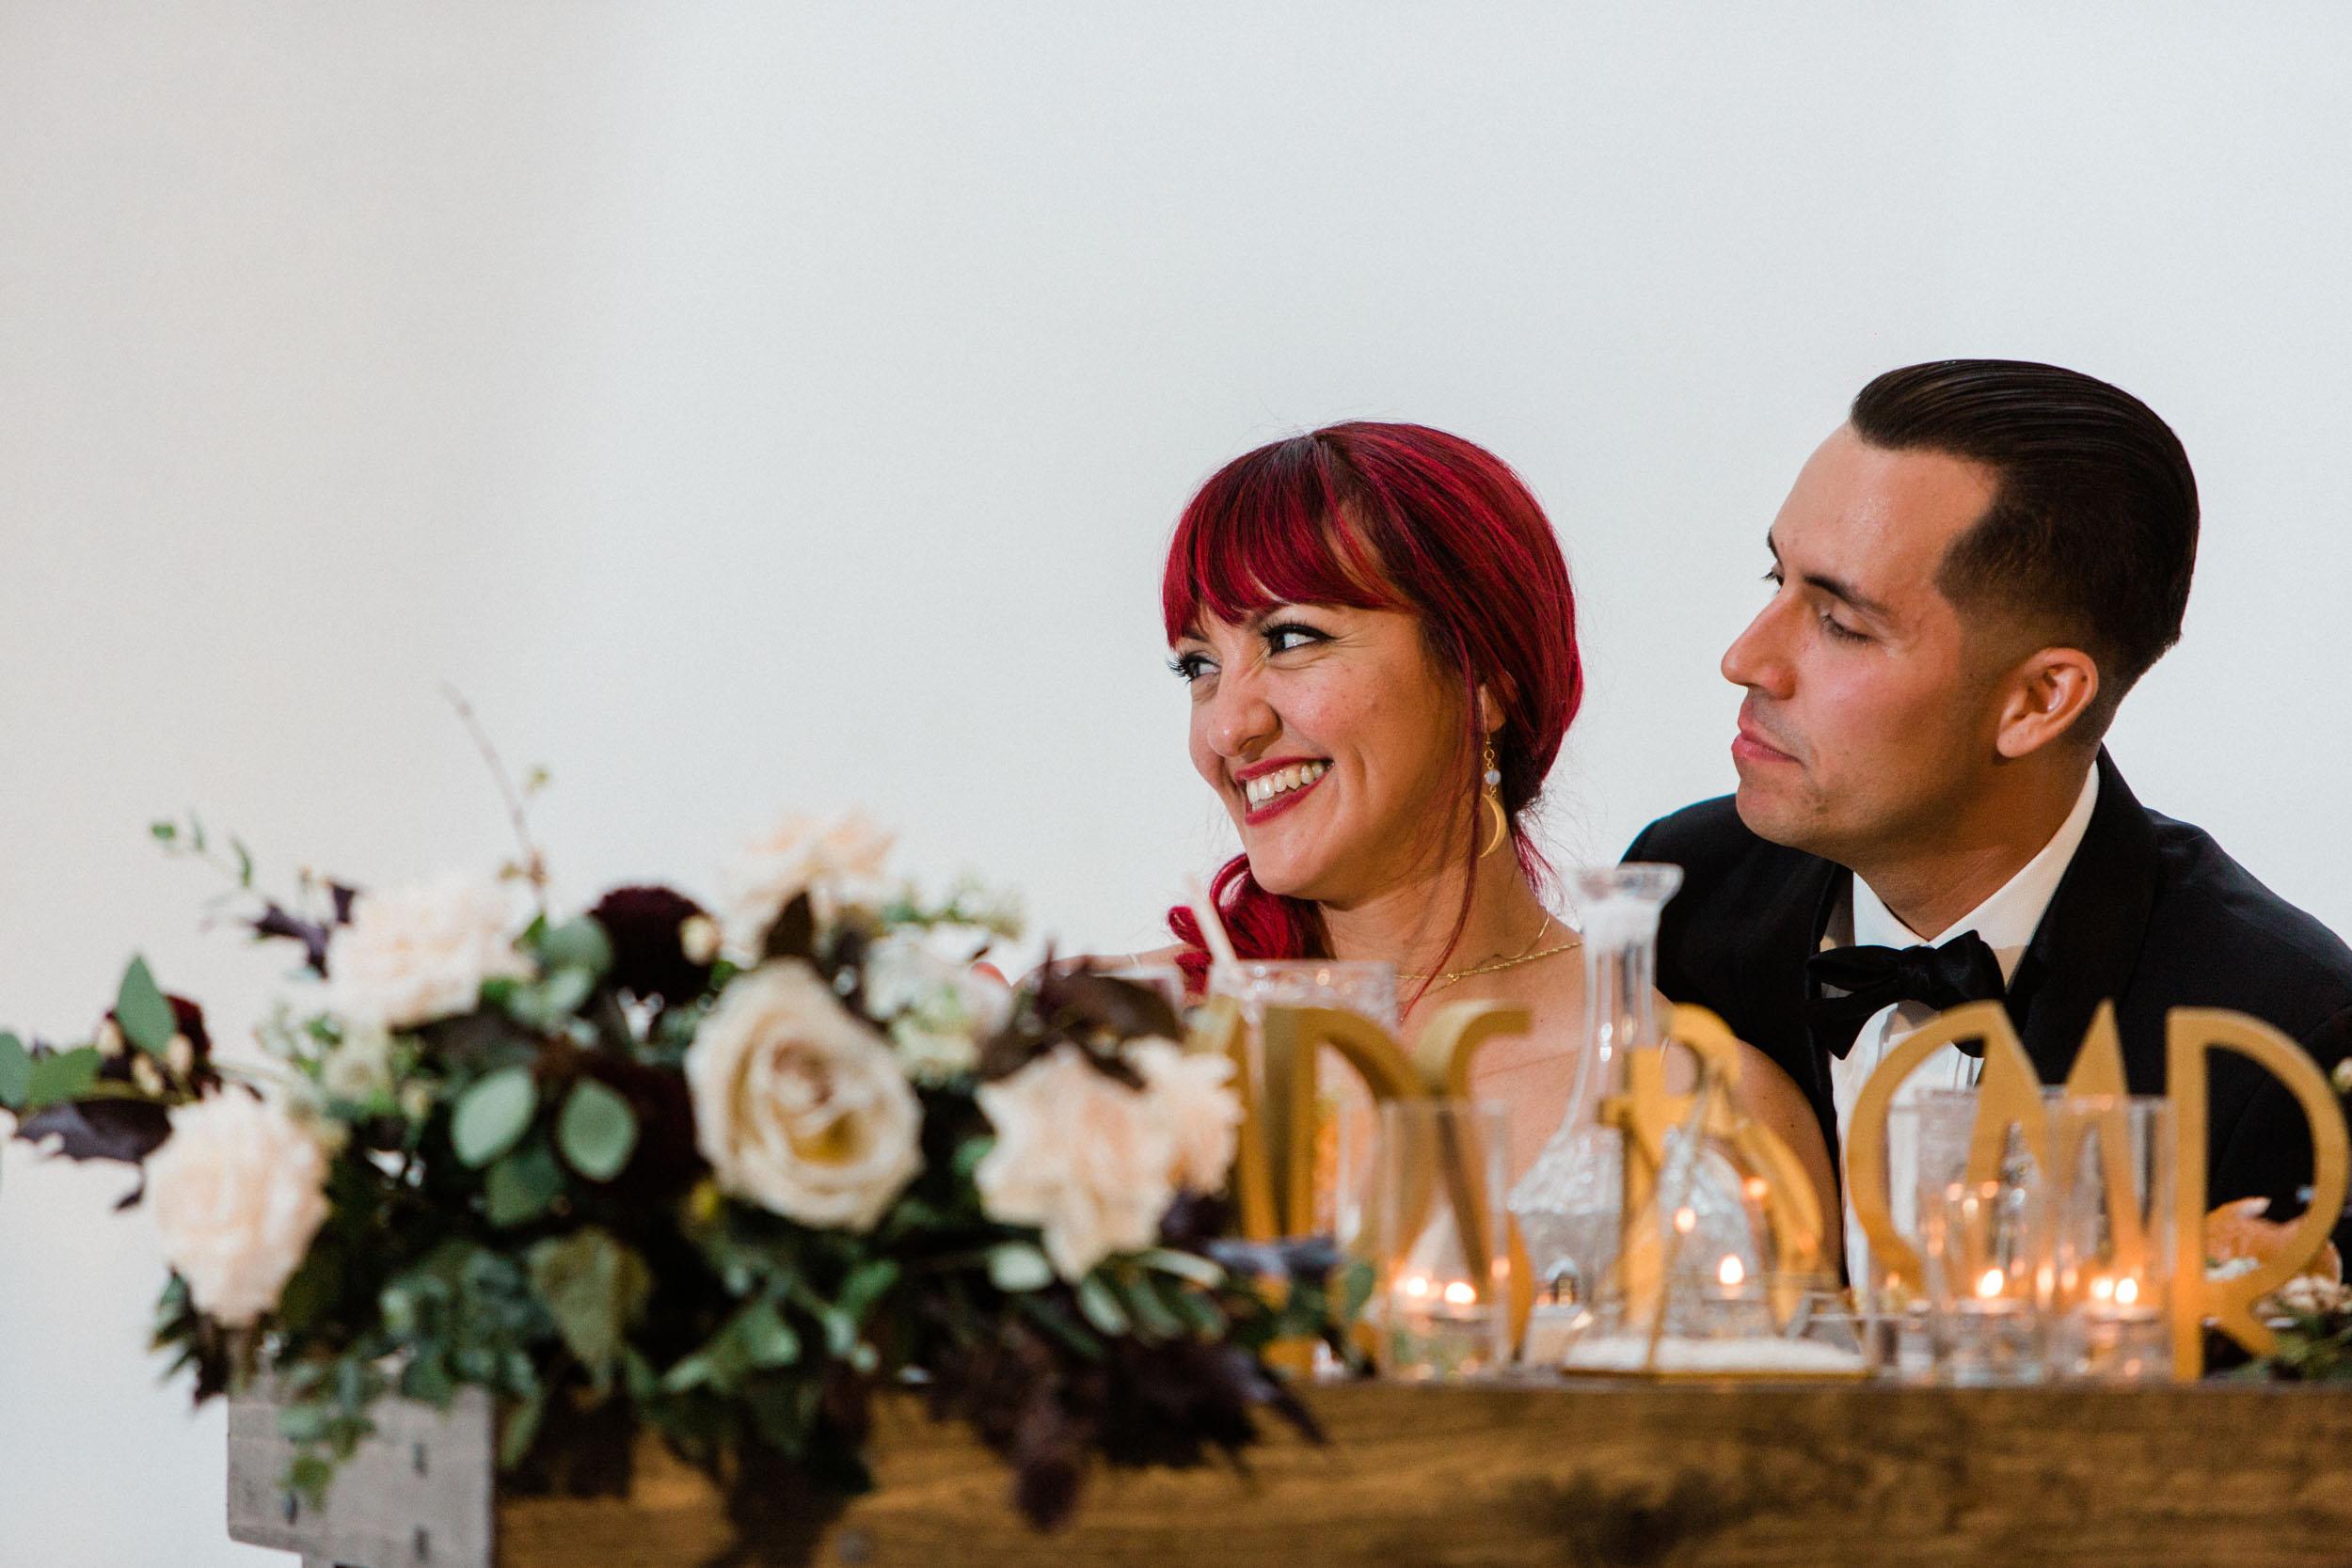 BKM-Photography-Los-Angeles-Highland-Park-York-Manor-Wedding-Photography-1192.jpg